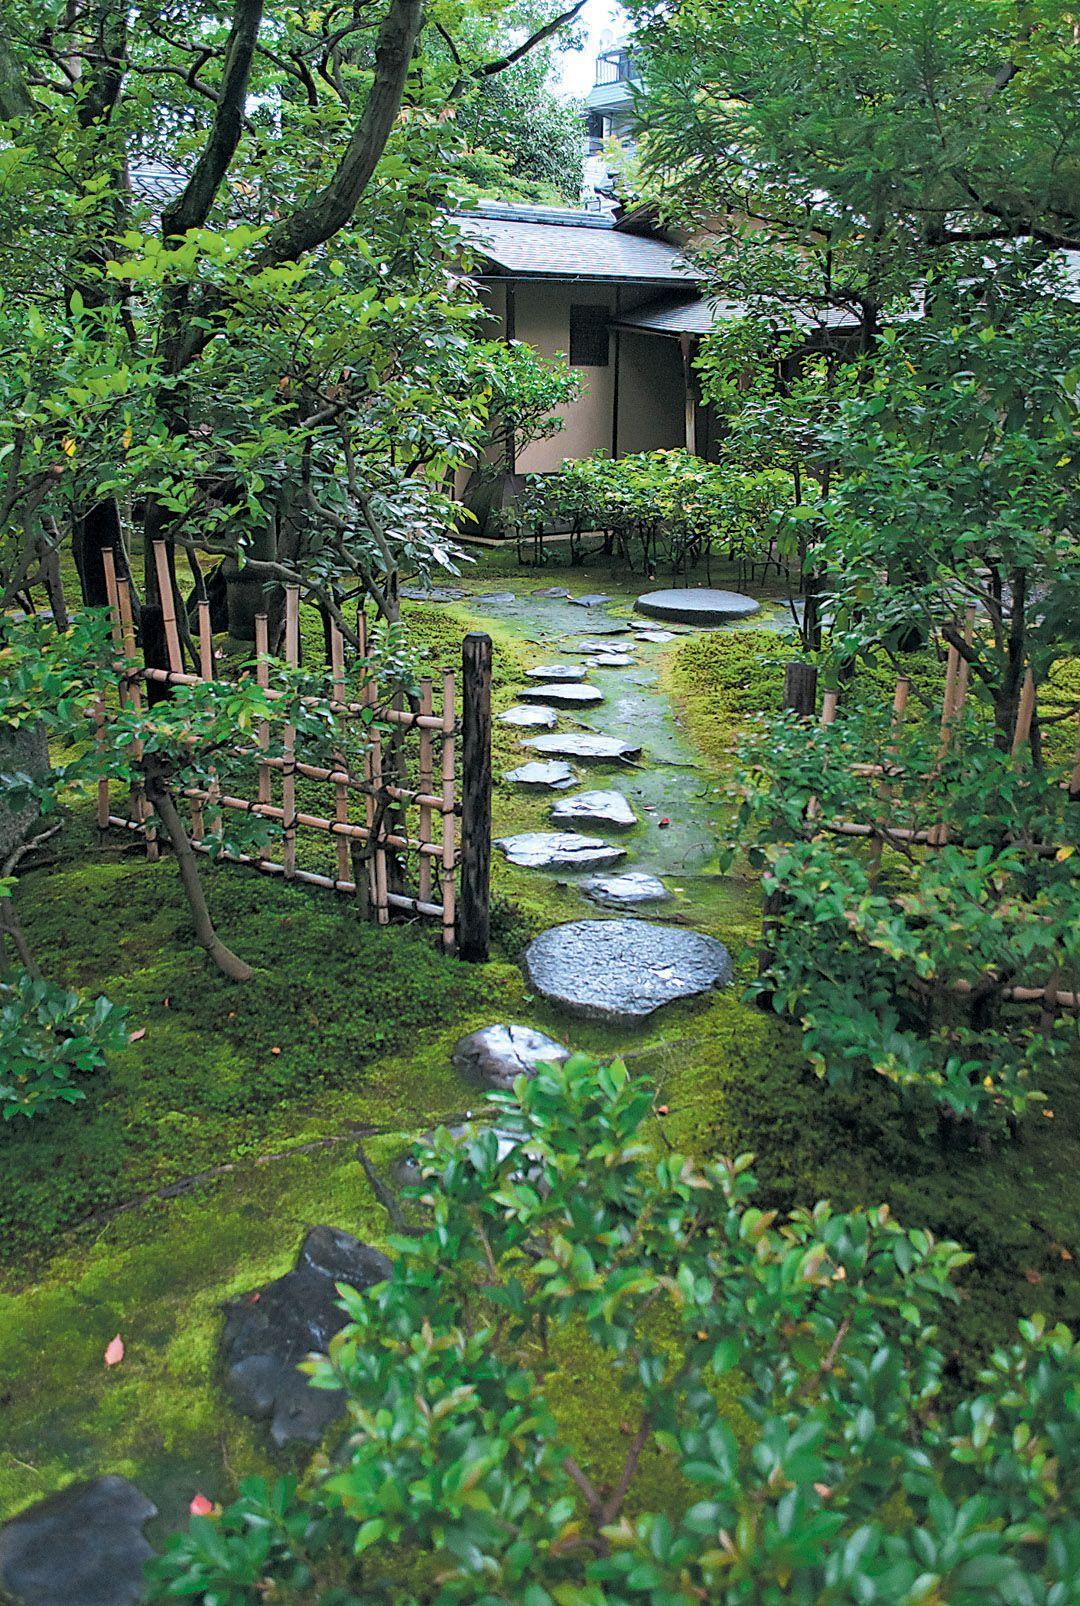 Pin By Fawe On Japan In 2020 Zen Garden Design Japanese Garden Japan Garden